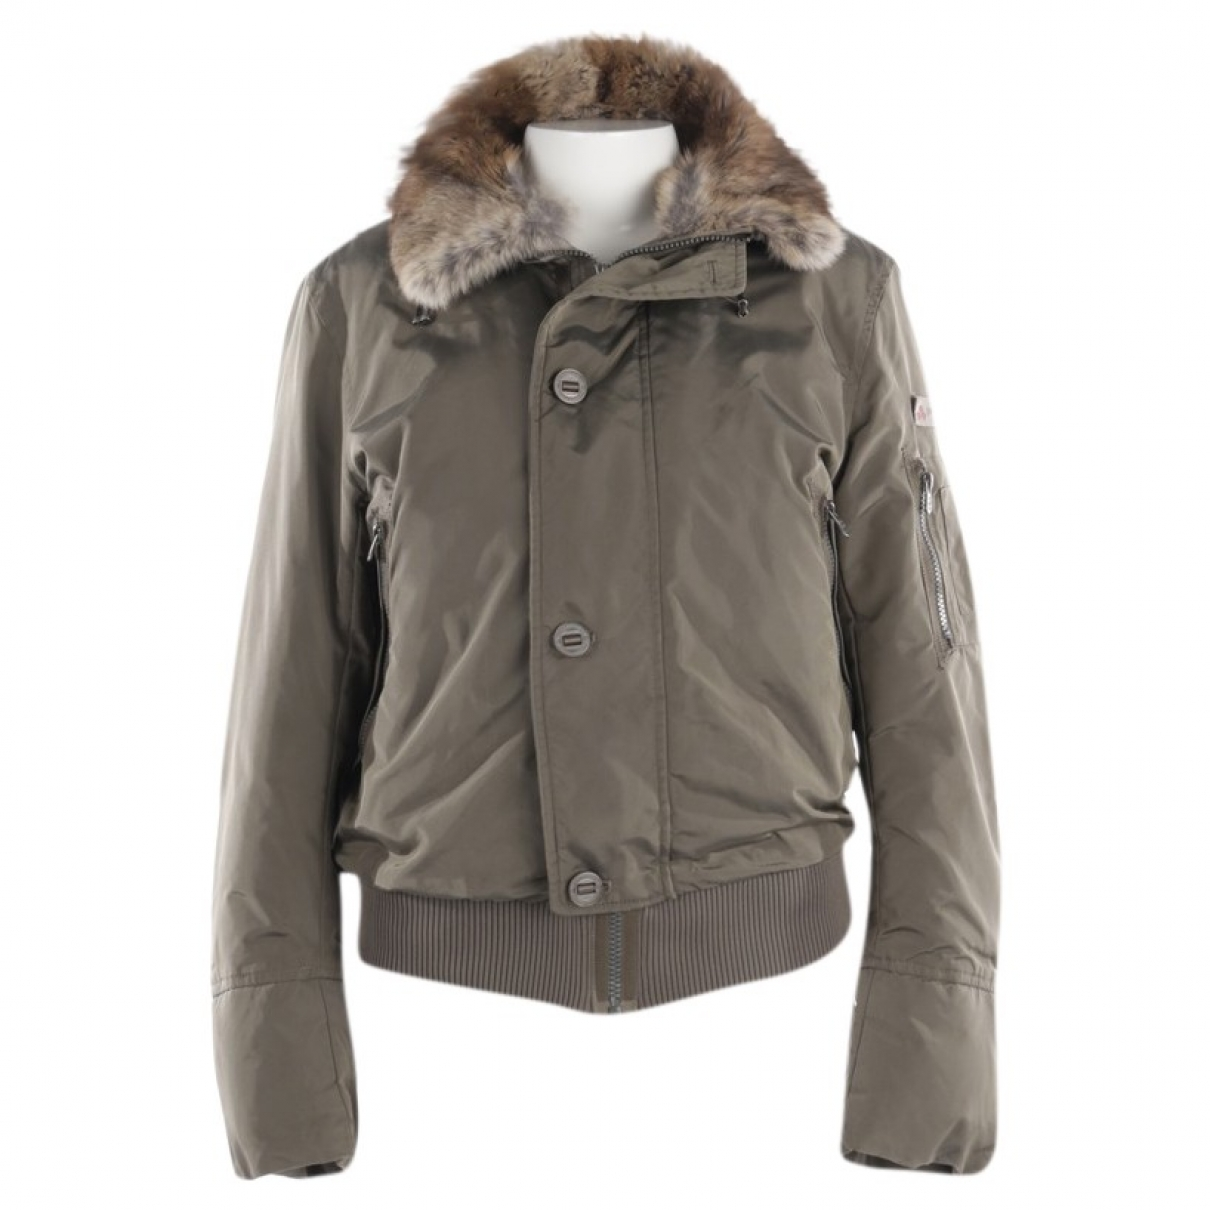 Peuterey \N Green jacket for Women XL International